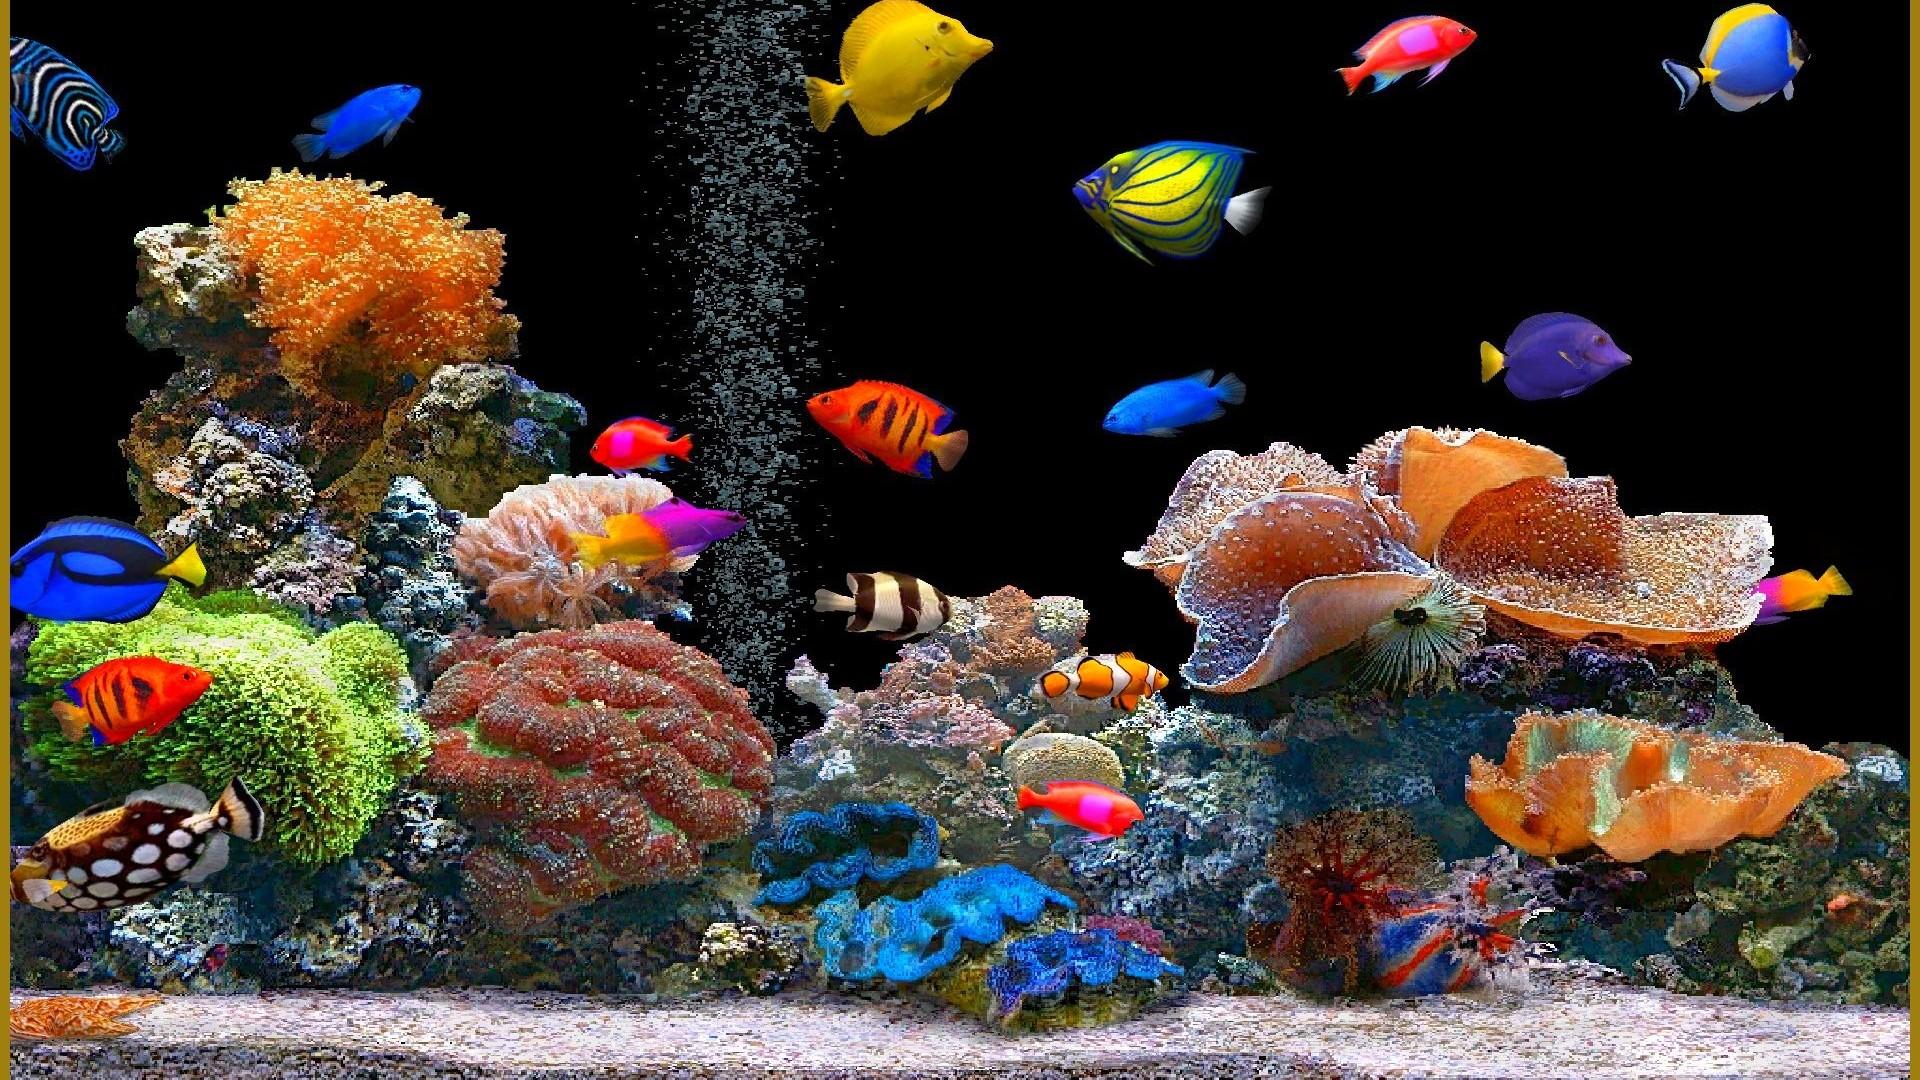 Animated Desktop Wallpaper Fish for Windows 81 All for Windows 10 1920x1080